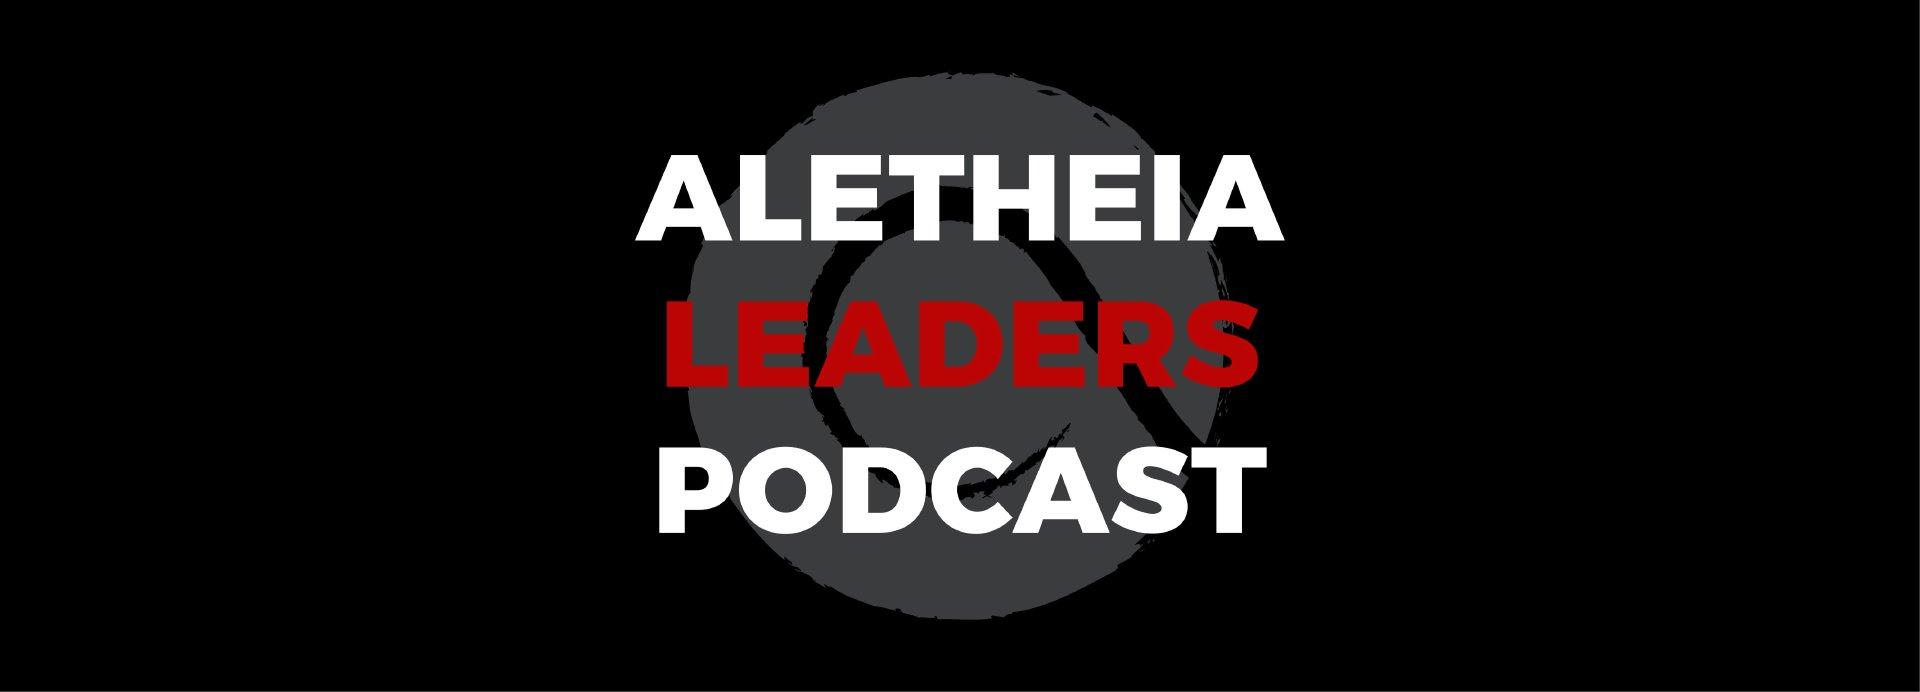 Aletheia Leadership Podcast Aletheia Church